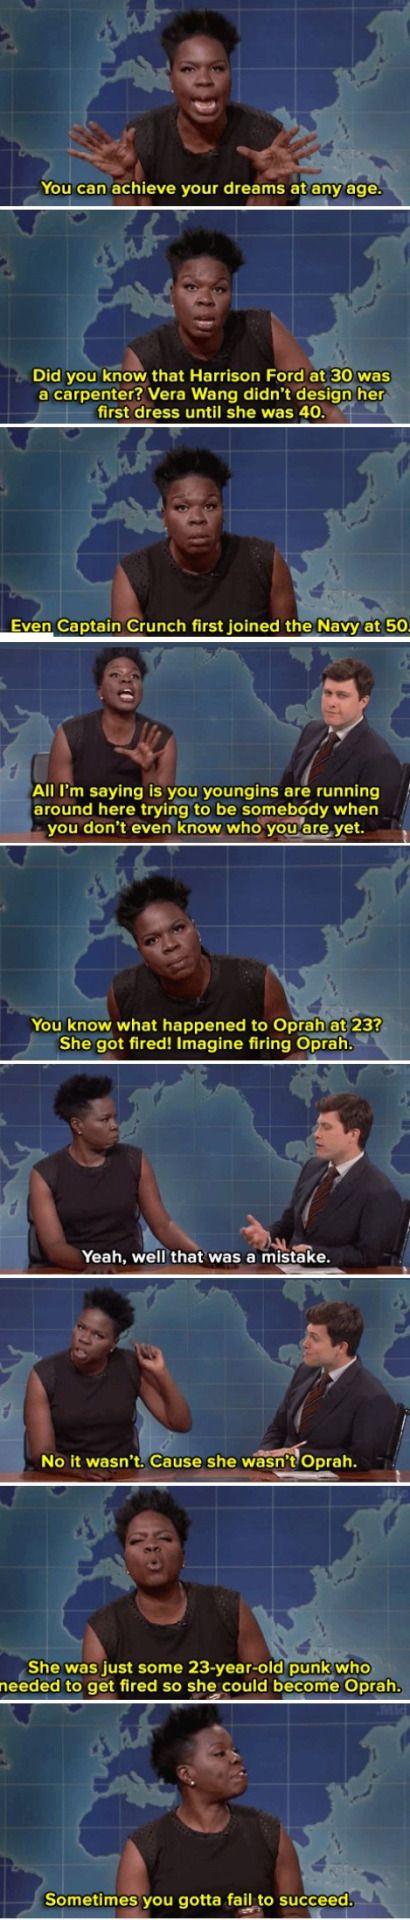 The brilliant Leslie Jones on SNL